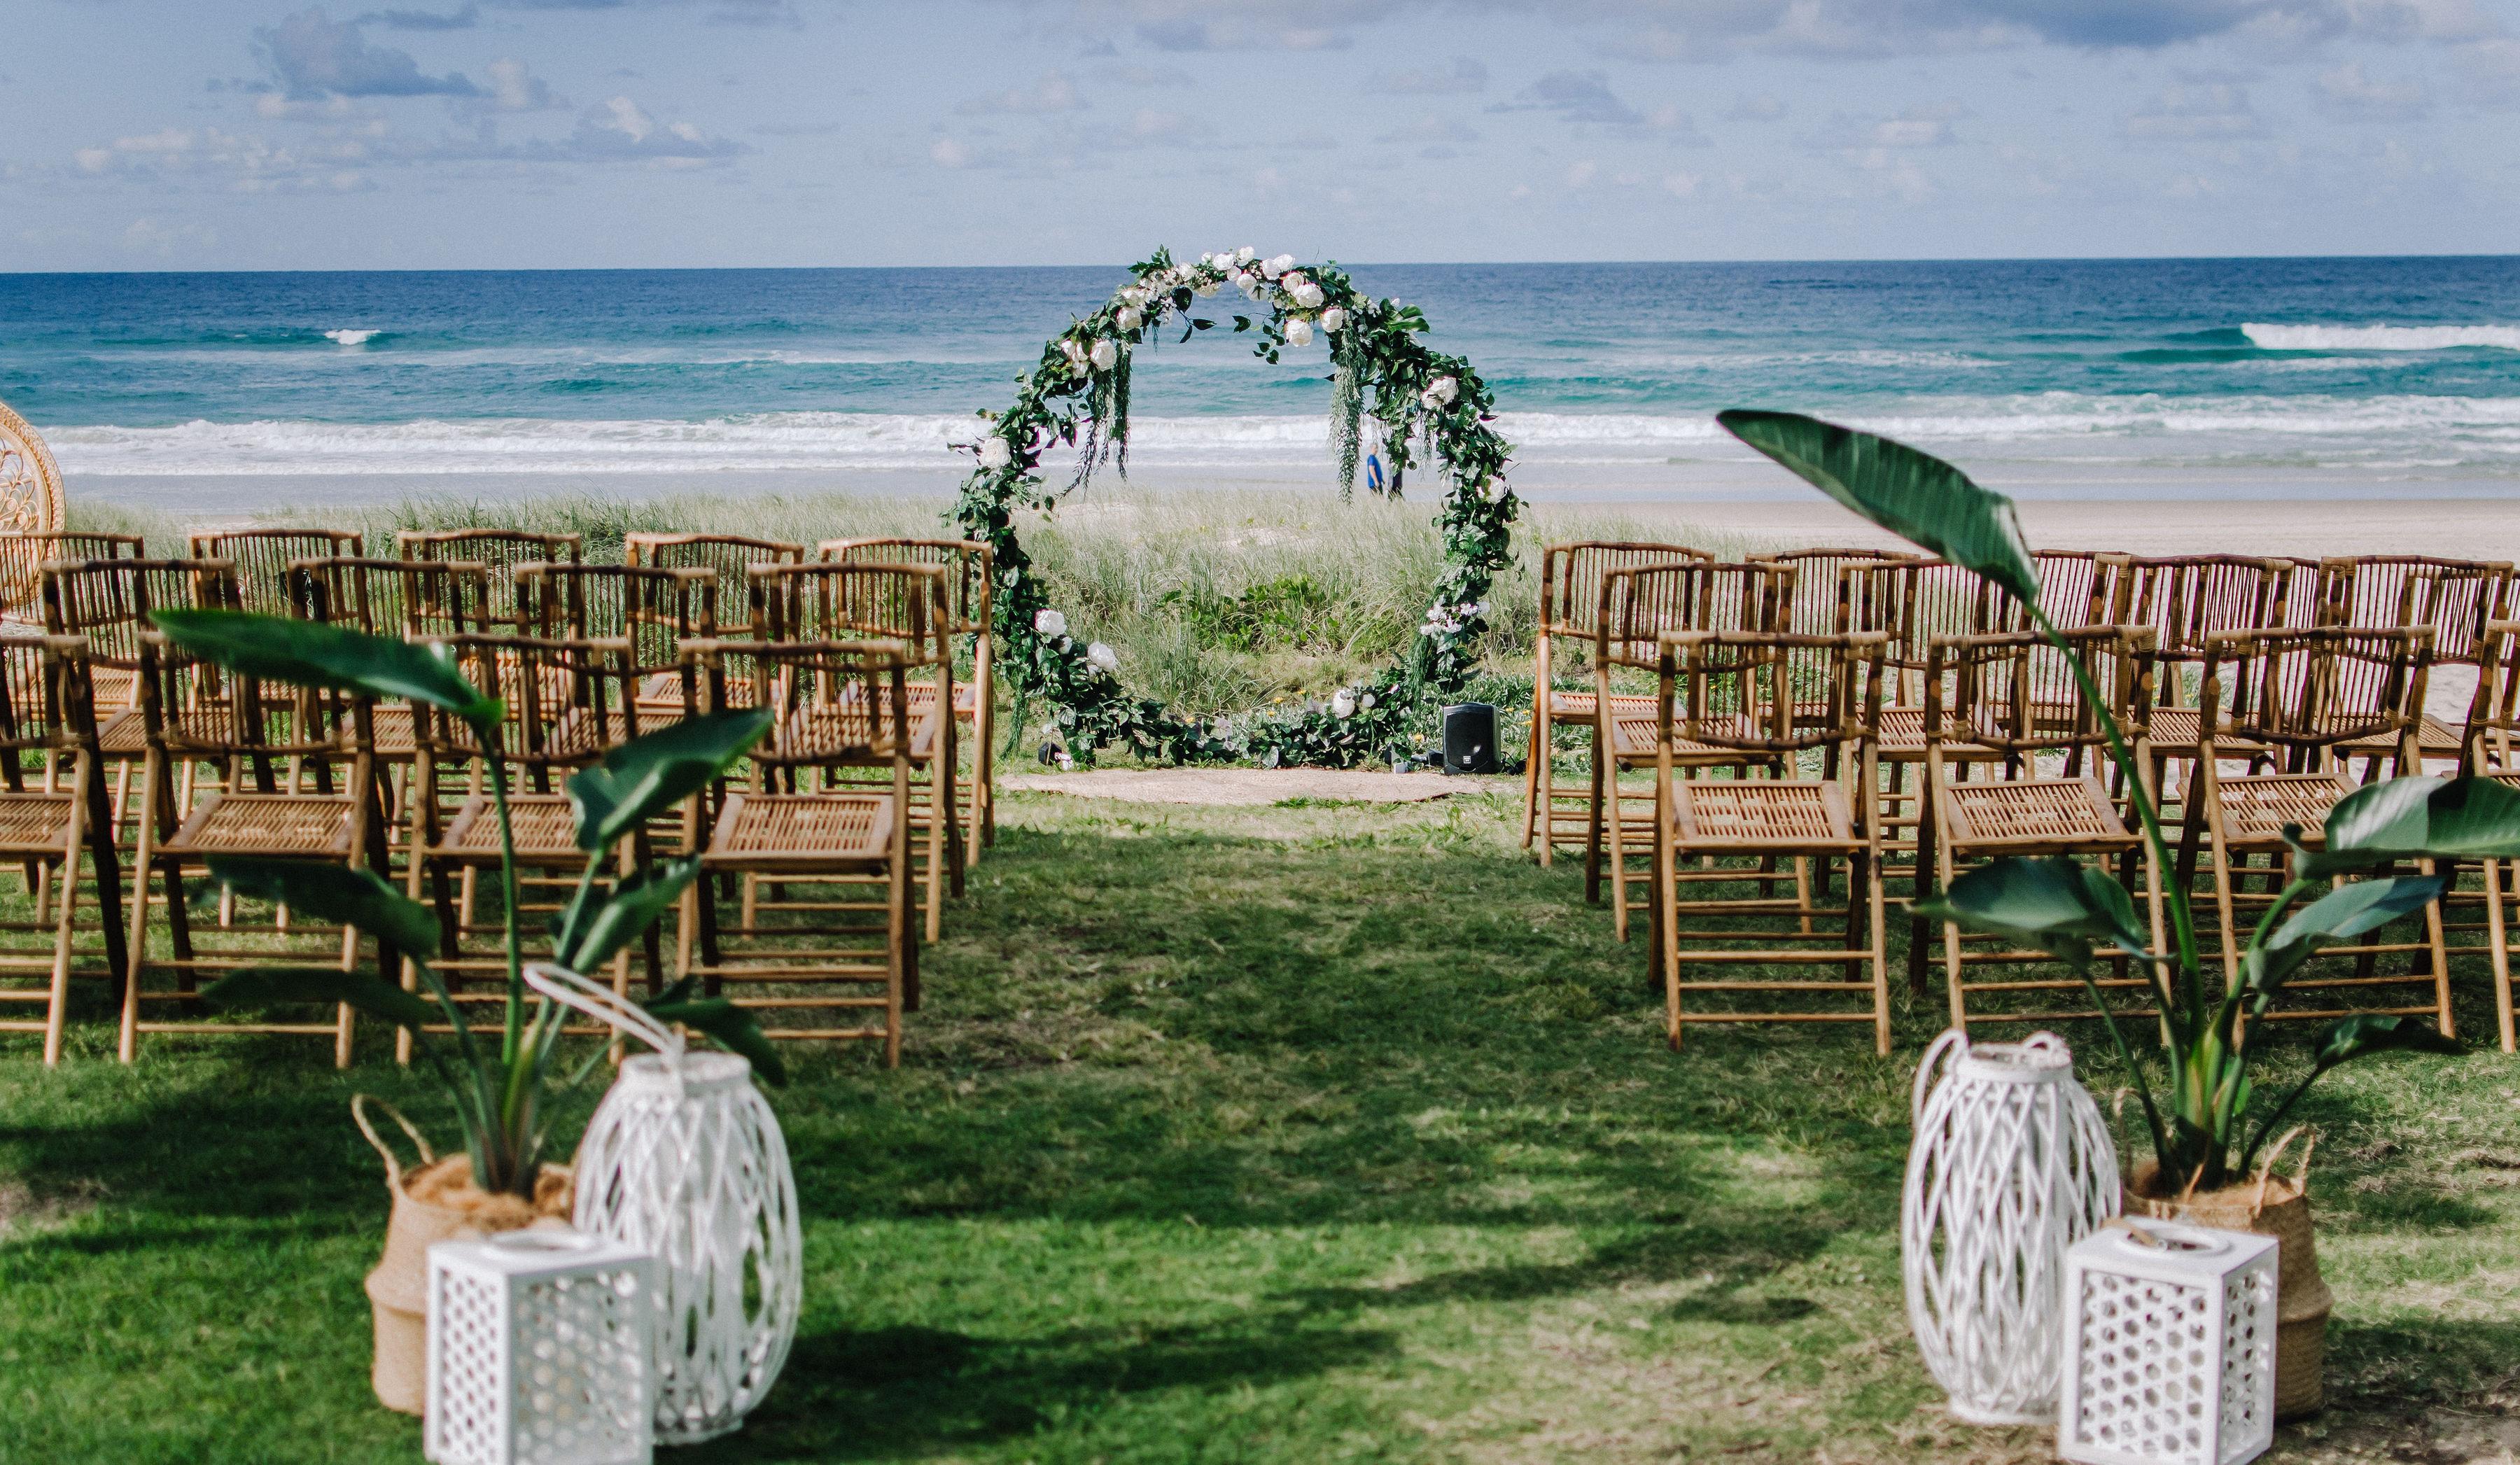 Gold Coast Beach wedding reception venue photos